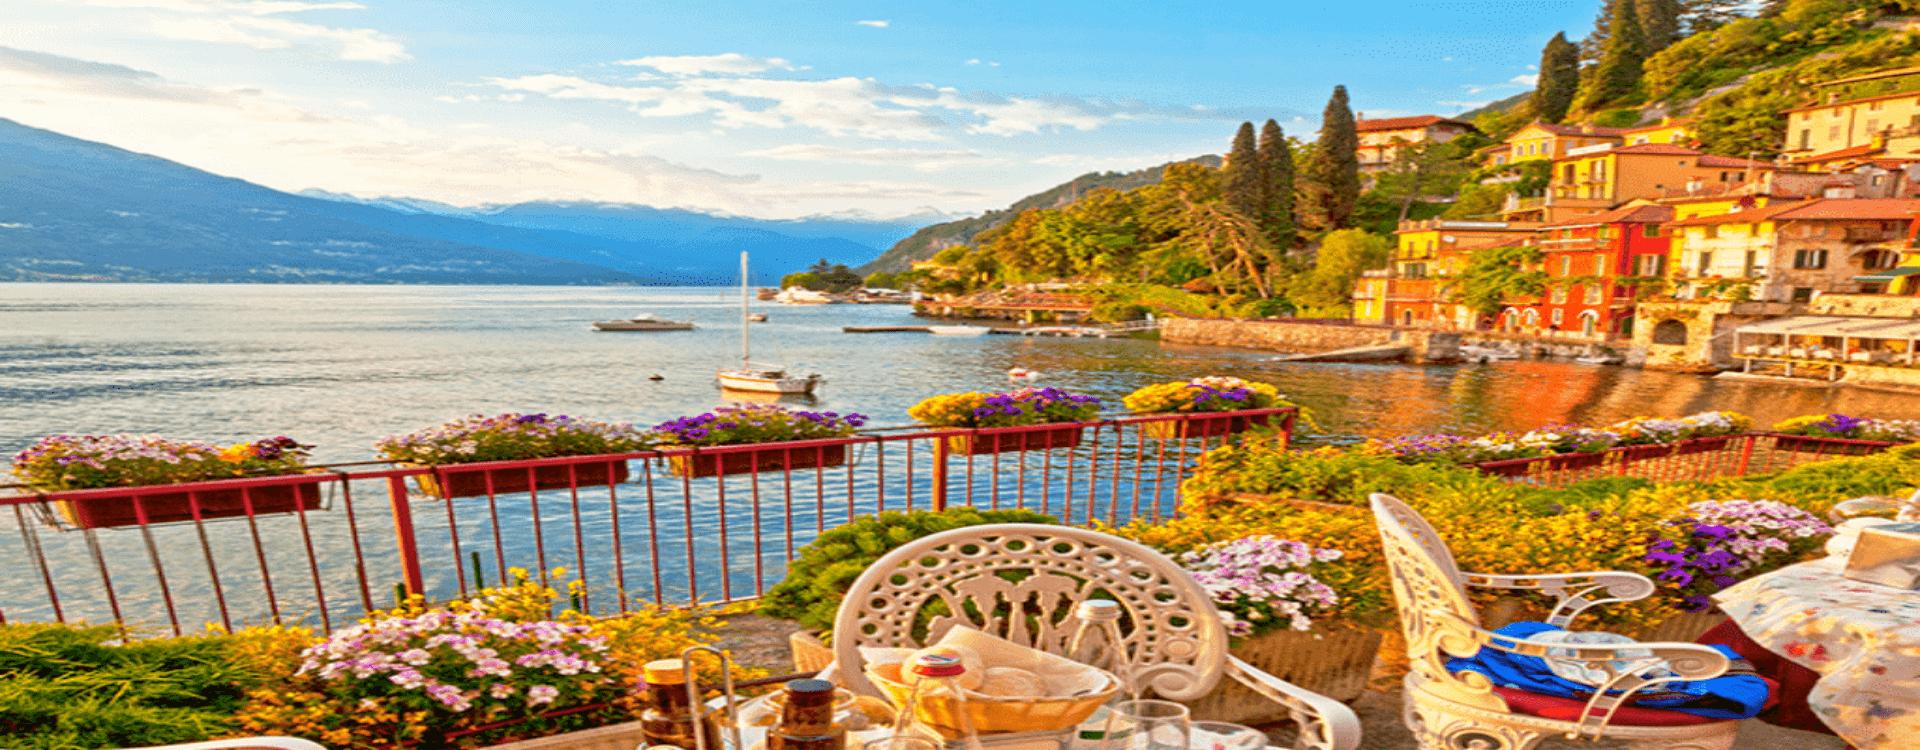 Top 7 obiective turistice lacul como italia locul for Cu ci na roma